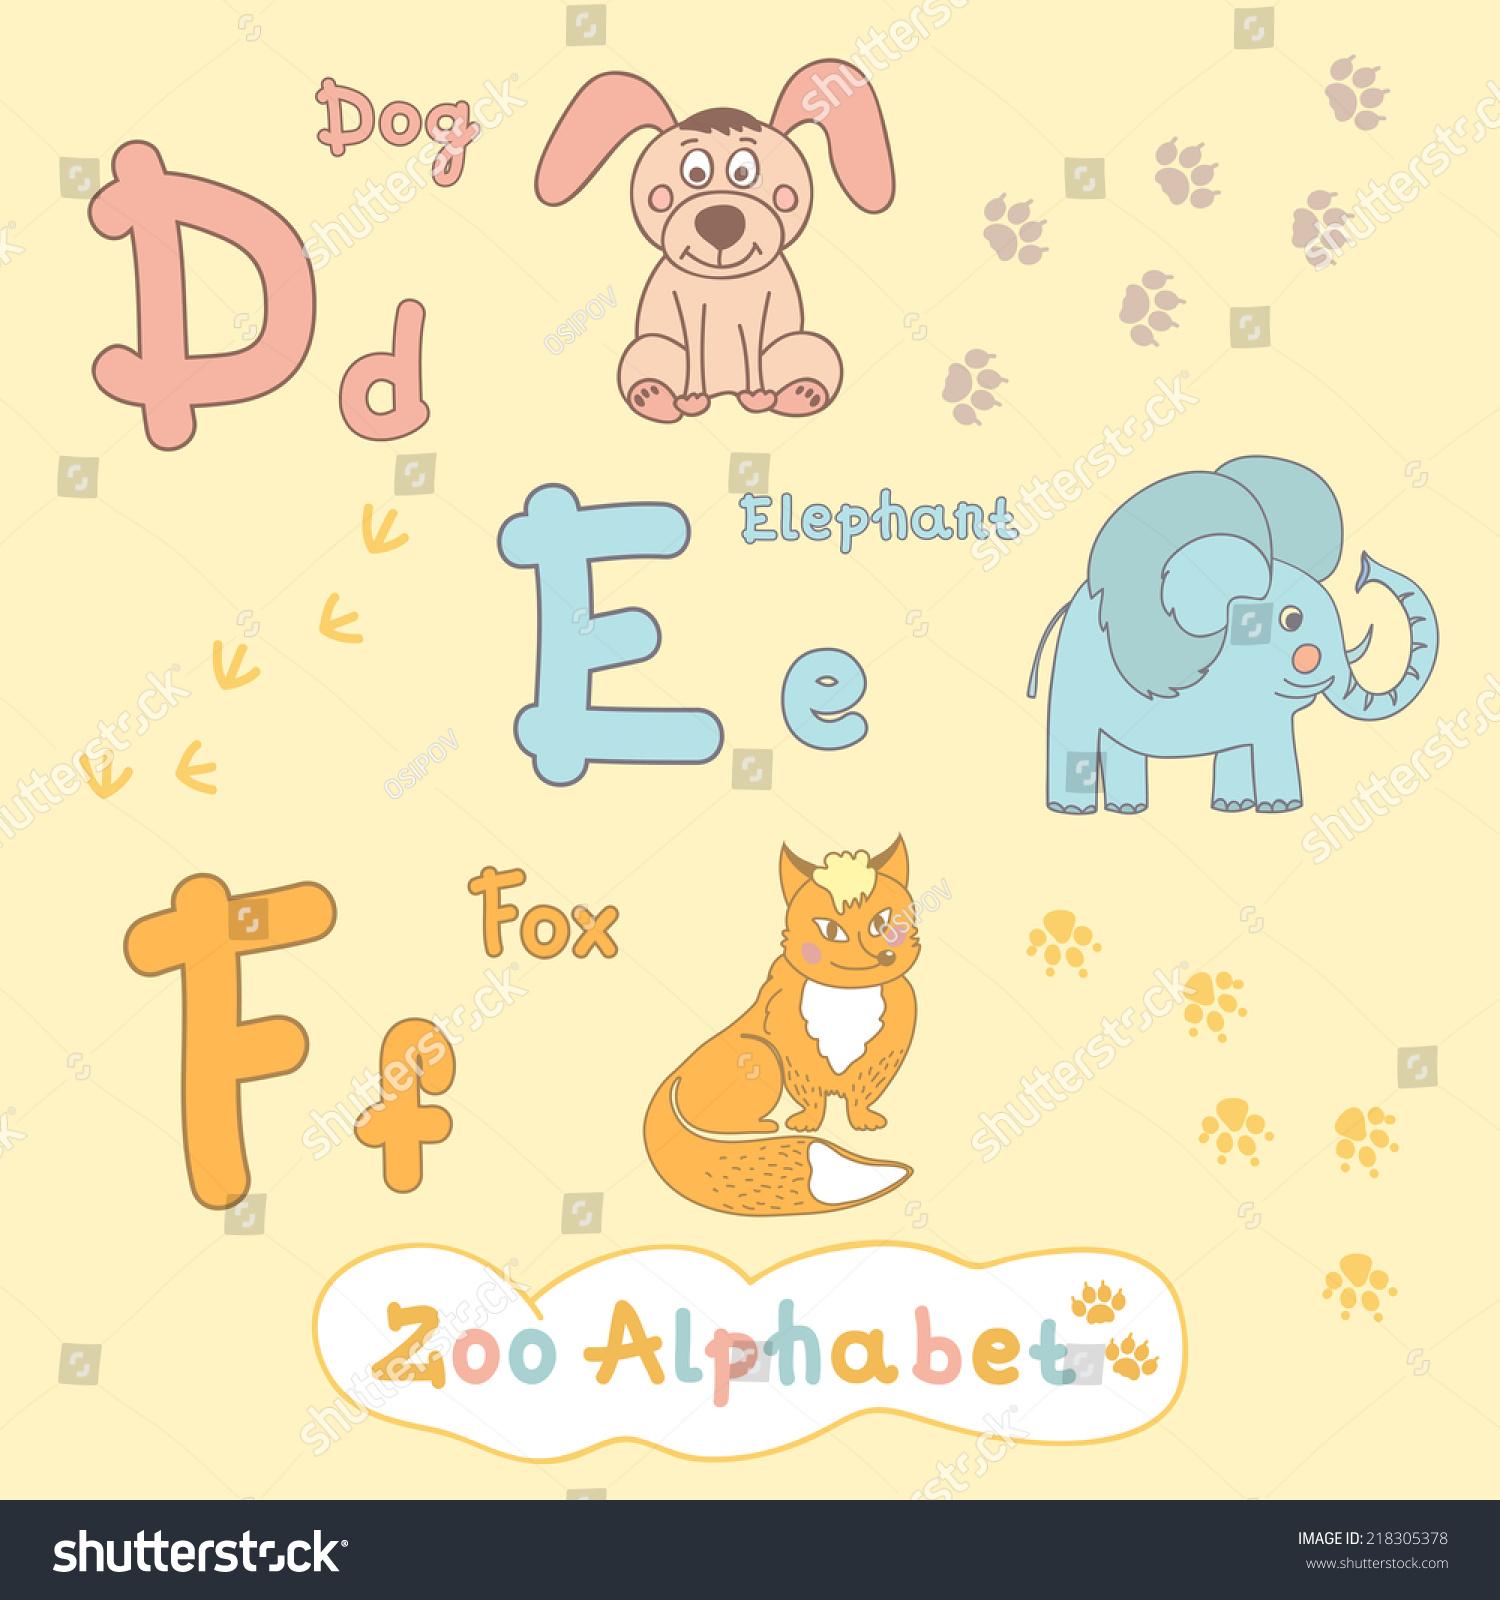 childrens alphabet animals dog elephant fox stock vector royalty